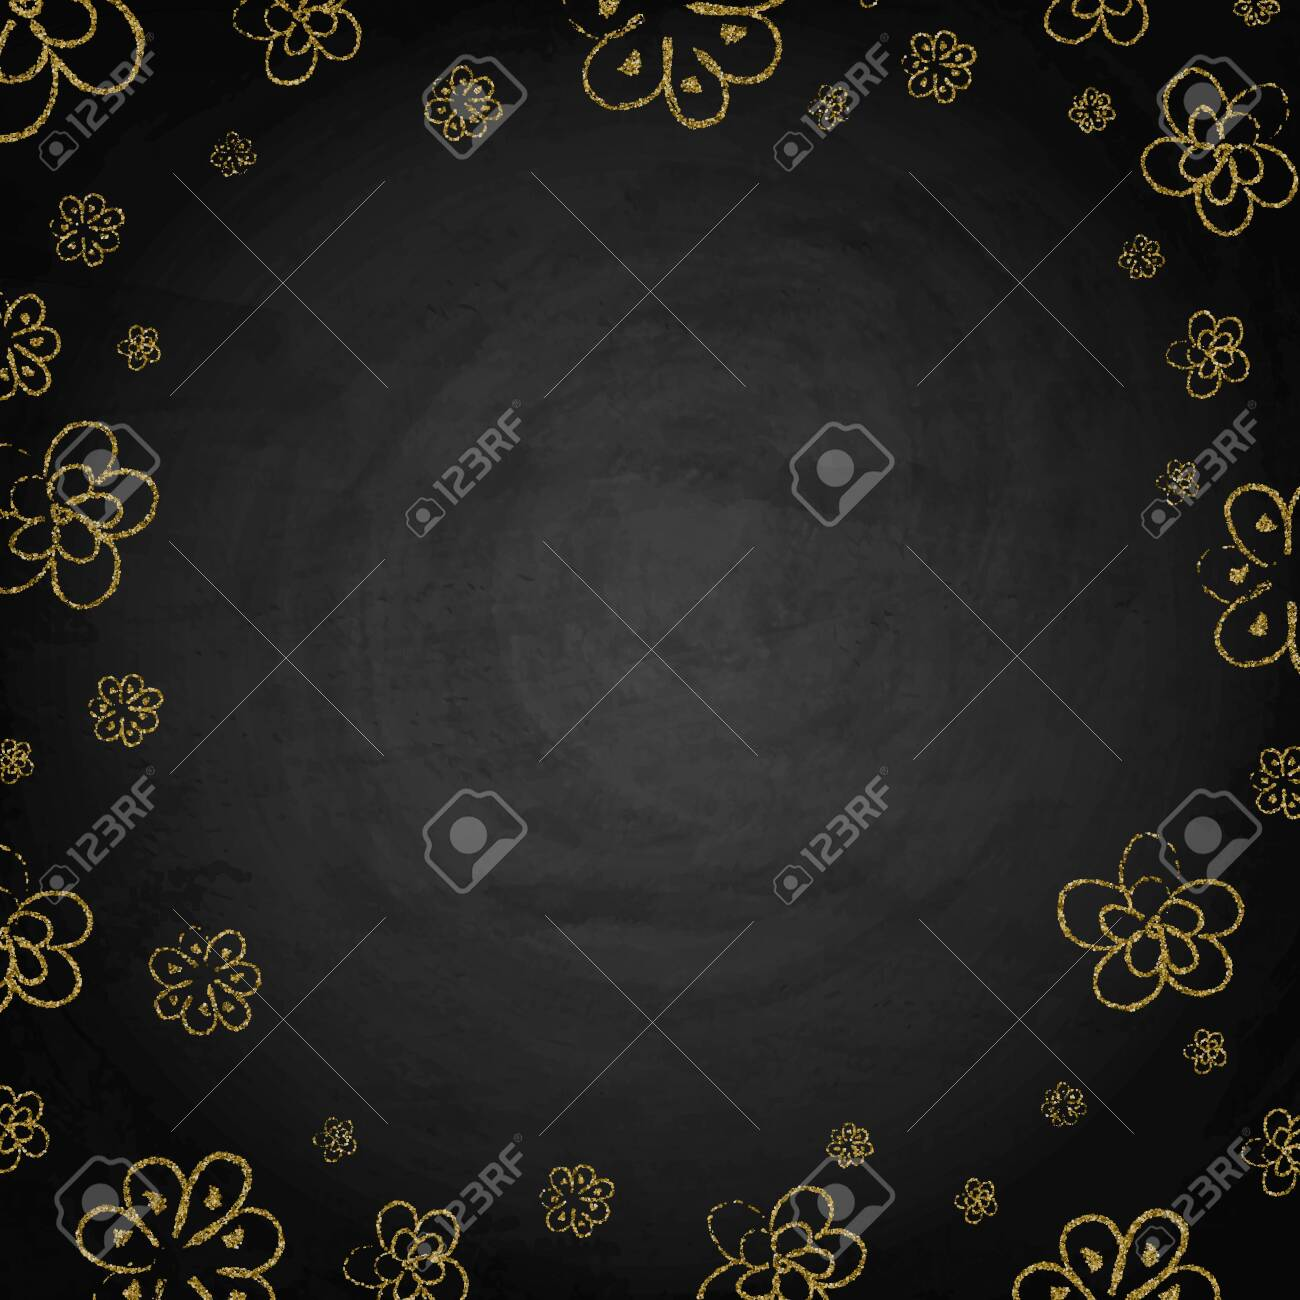 Handdrawn golden flowers on blackboard chalkboard background. Vector illustration - 124306039